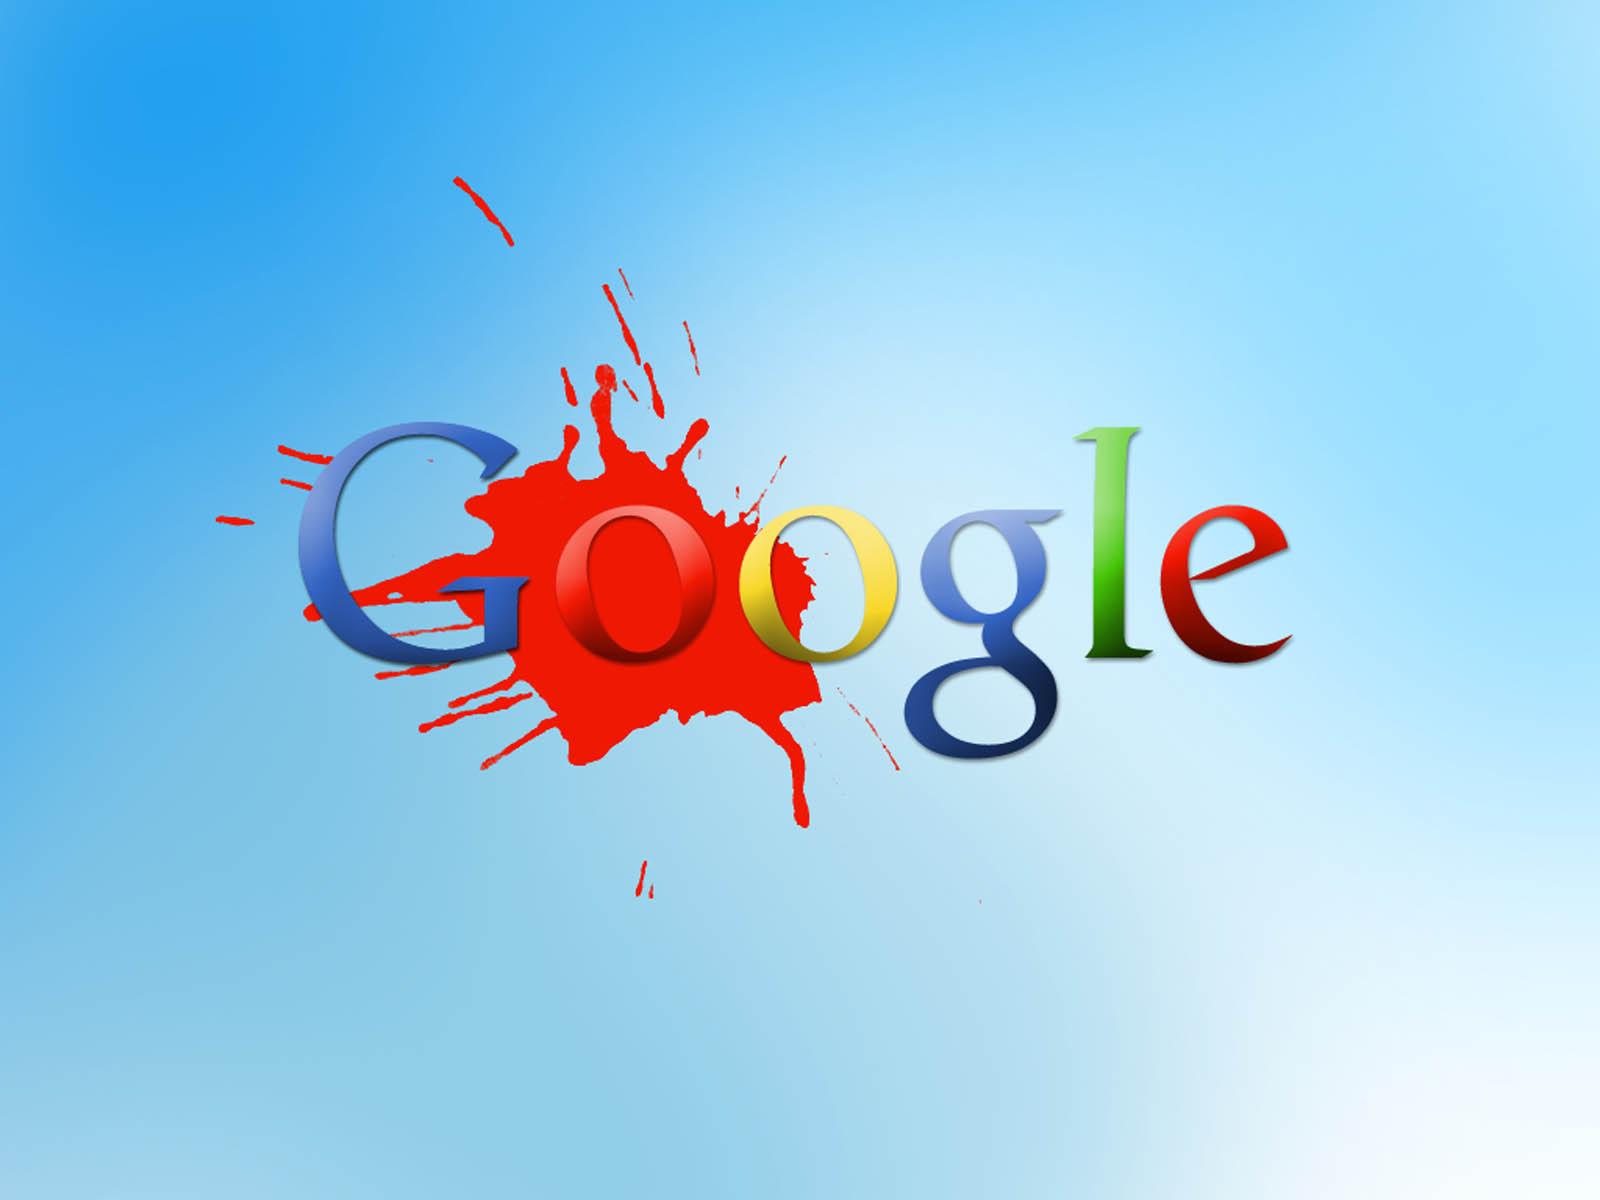 Google Desktop Clipart Backgrounds.